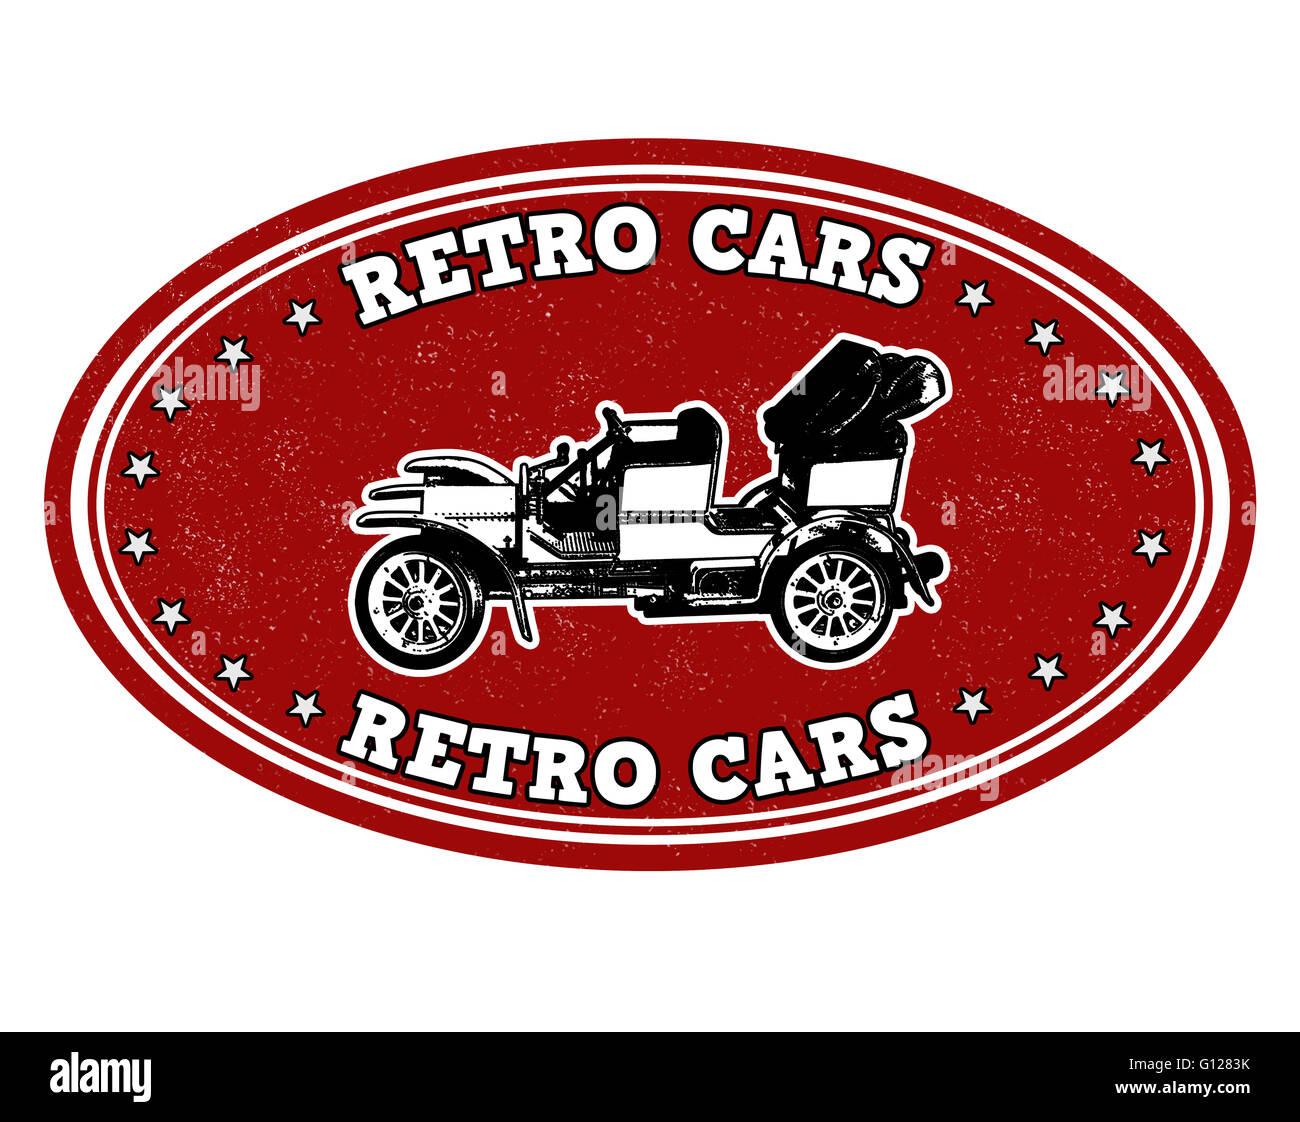 Retro cars grunge rubber stamp on white, vector illustration Stock Photo